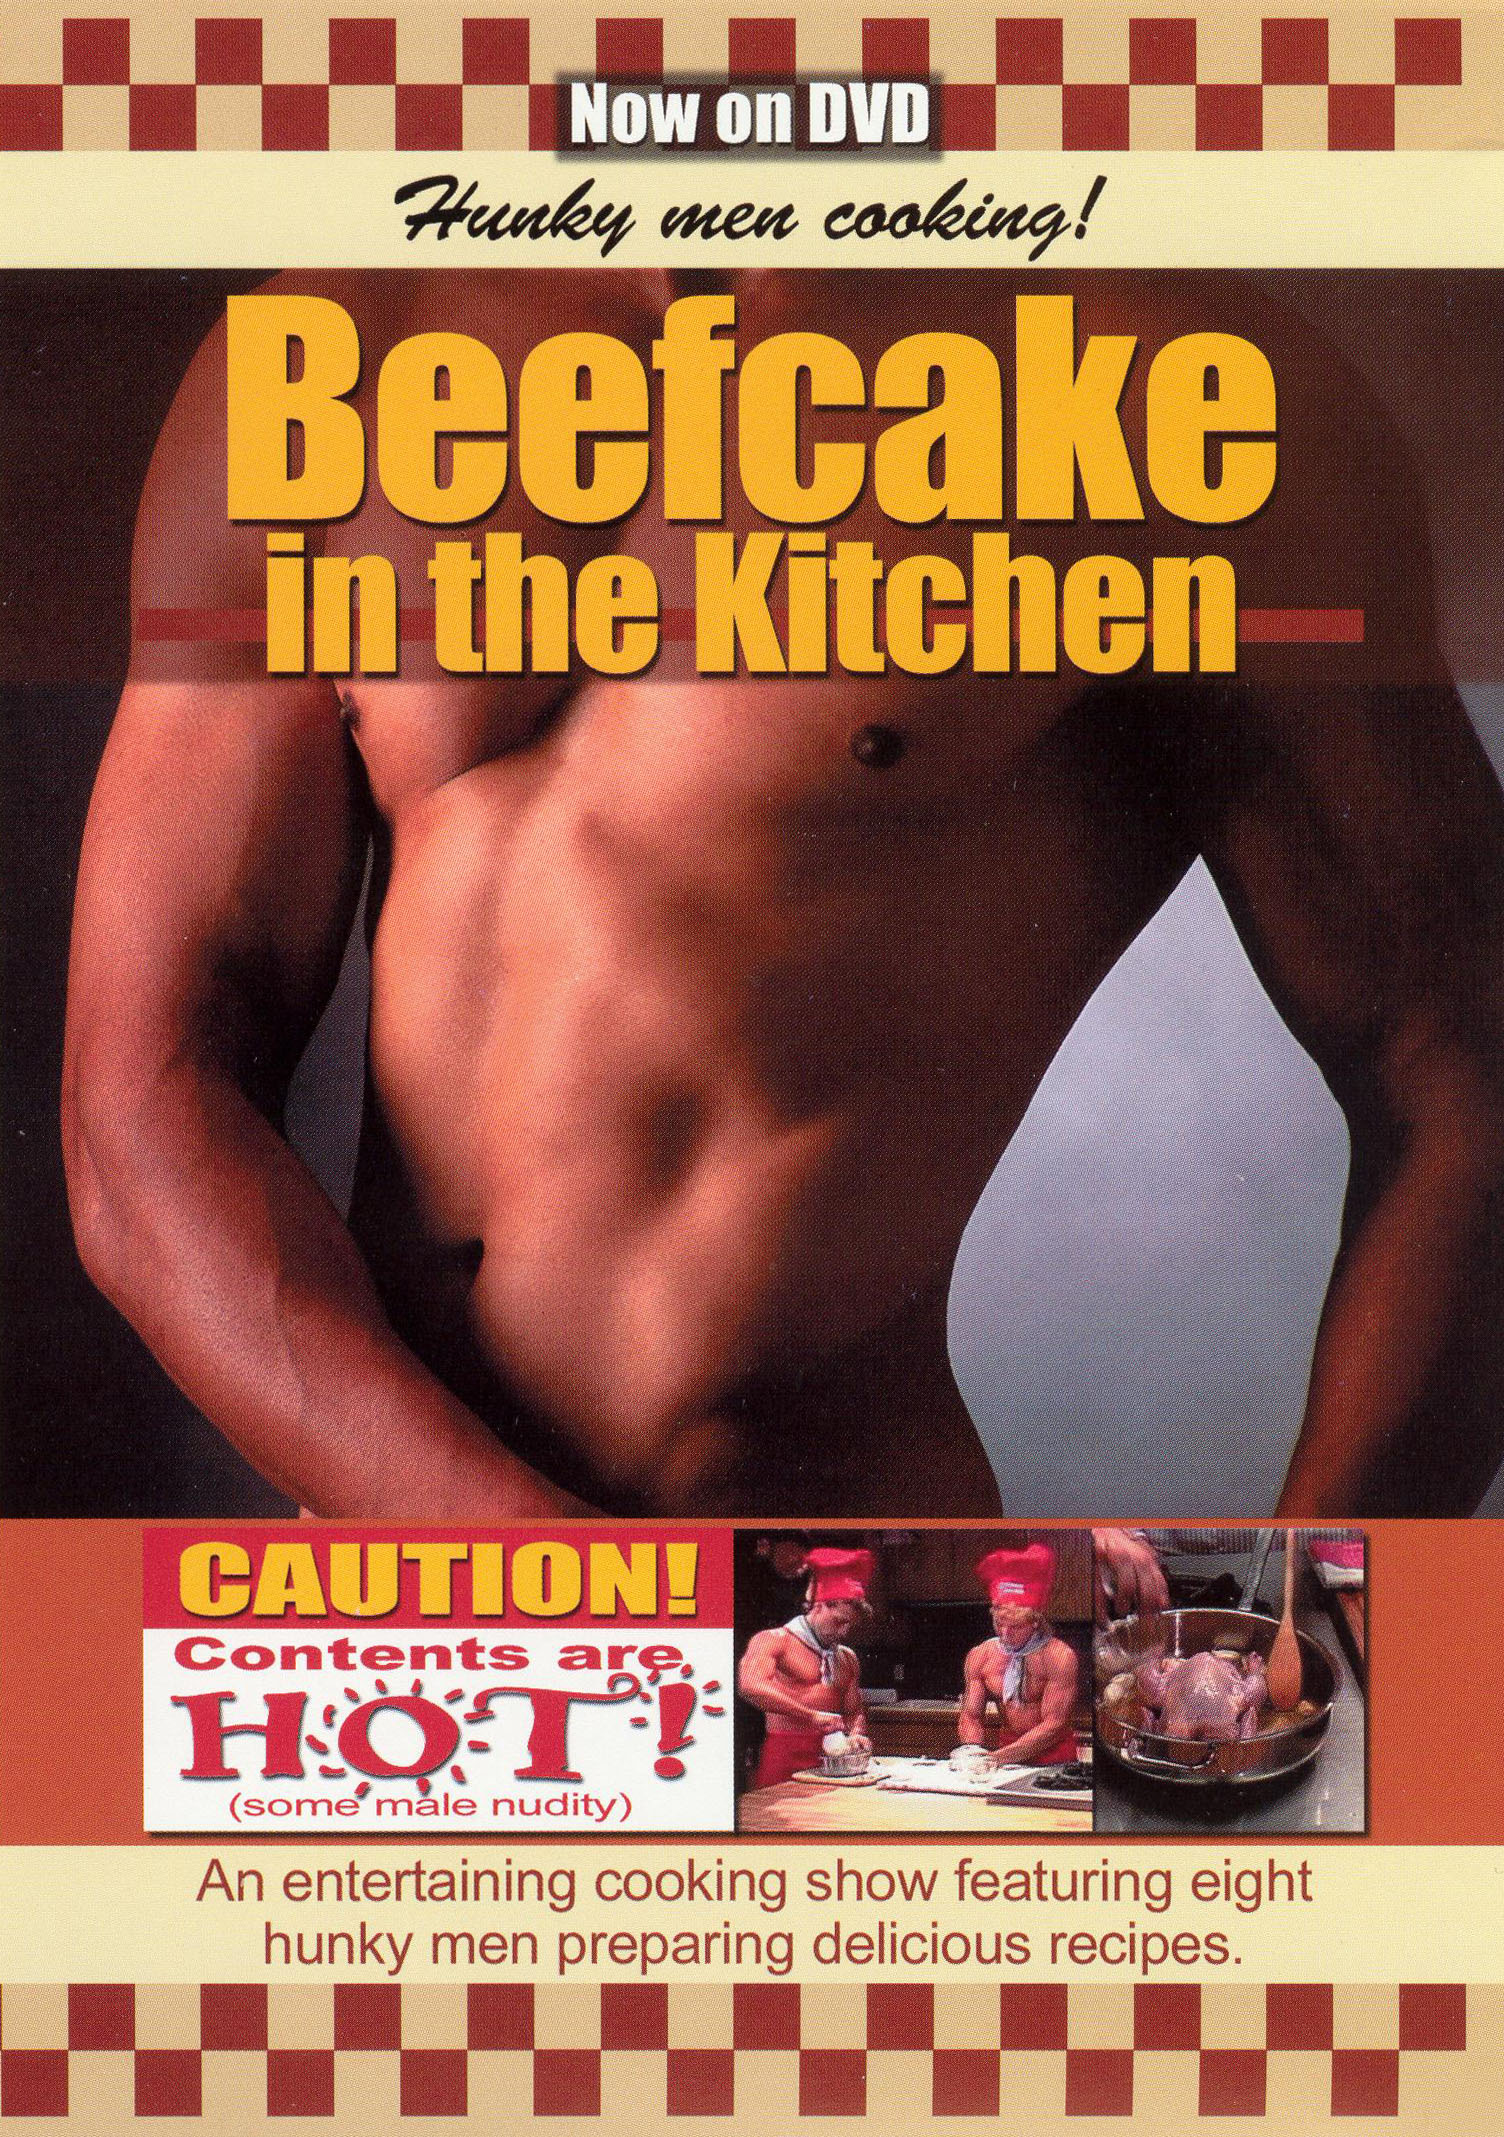 Beefcake in the Kitchen